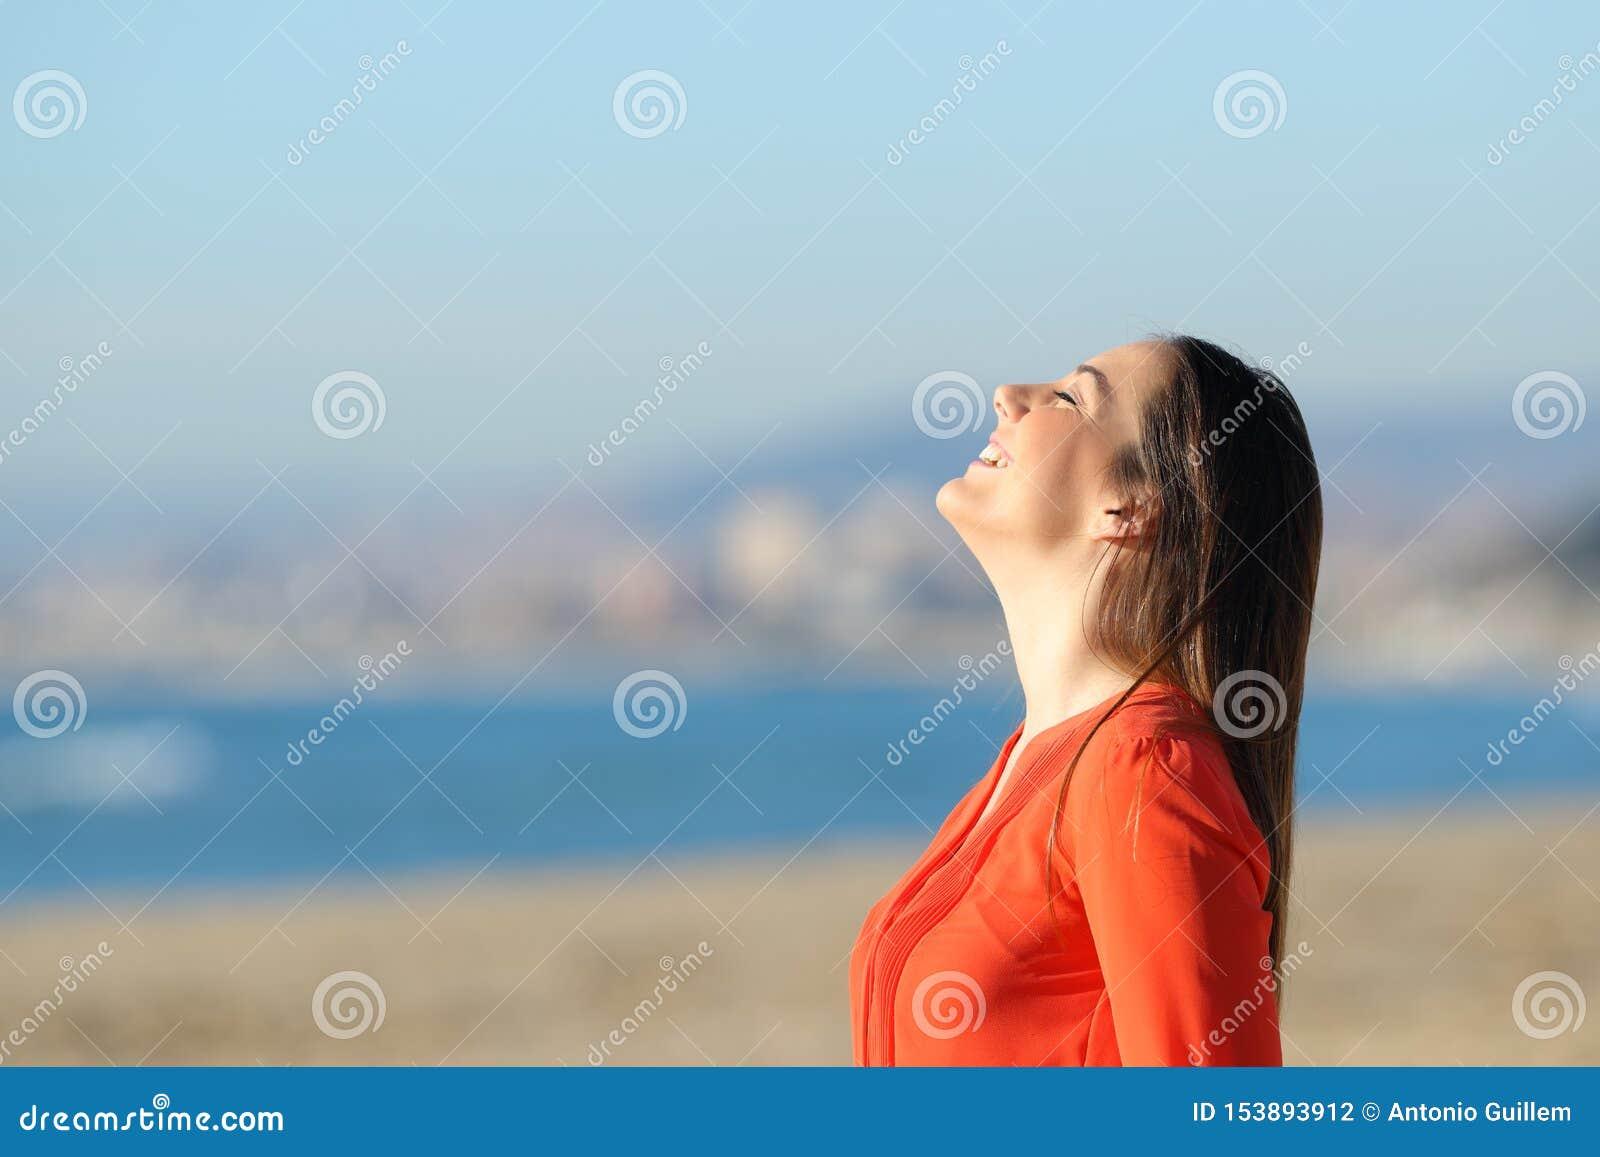 Woman in orange breathing fresh air on the beach